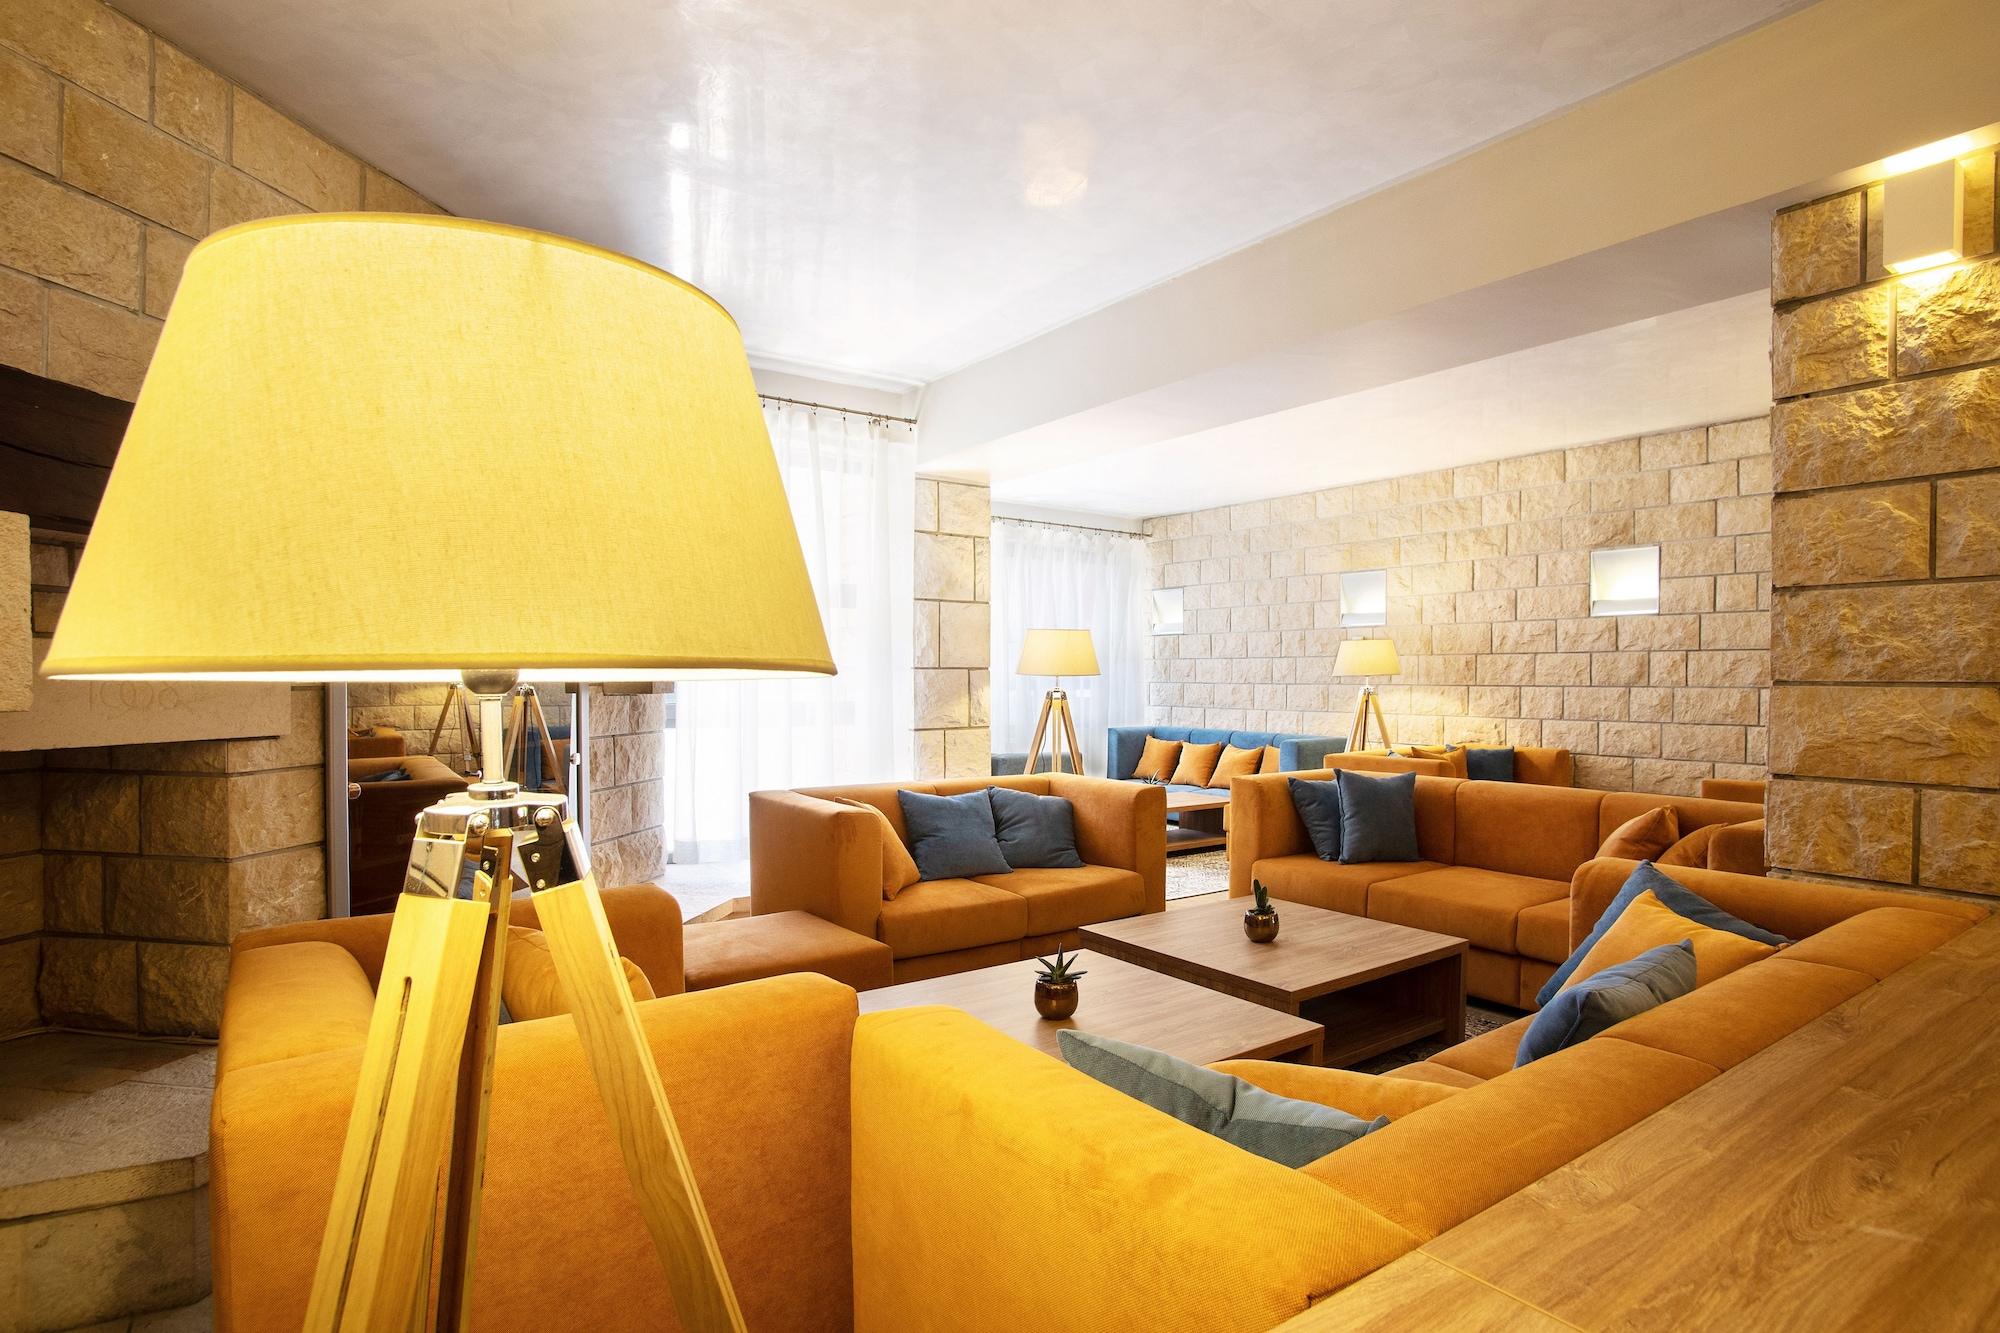 Hotel Haliaetum - San Simon Resort, Izola